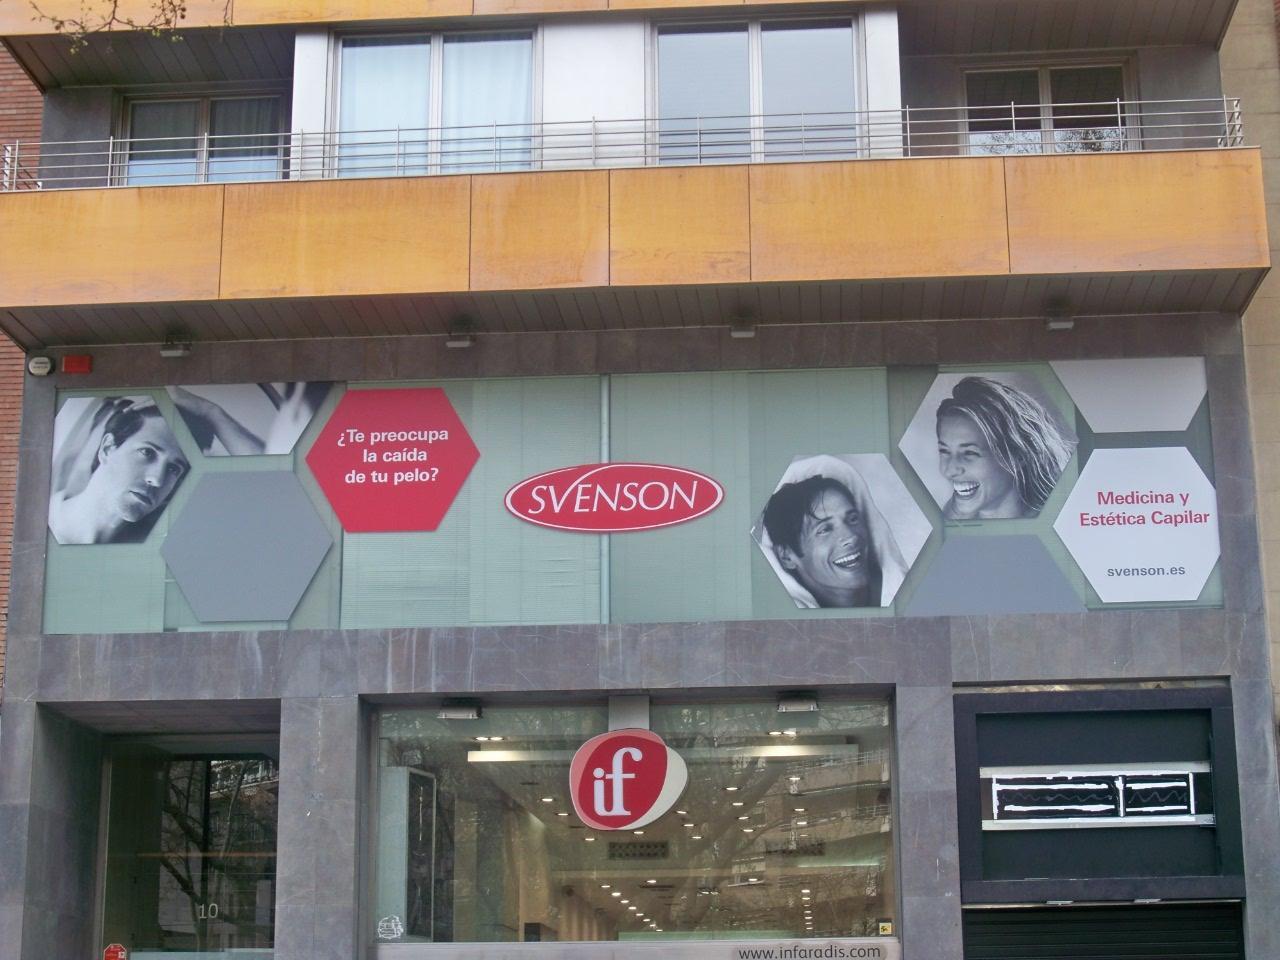 Centro Svenson Fachada Zaragoza